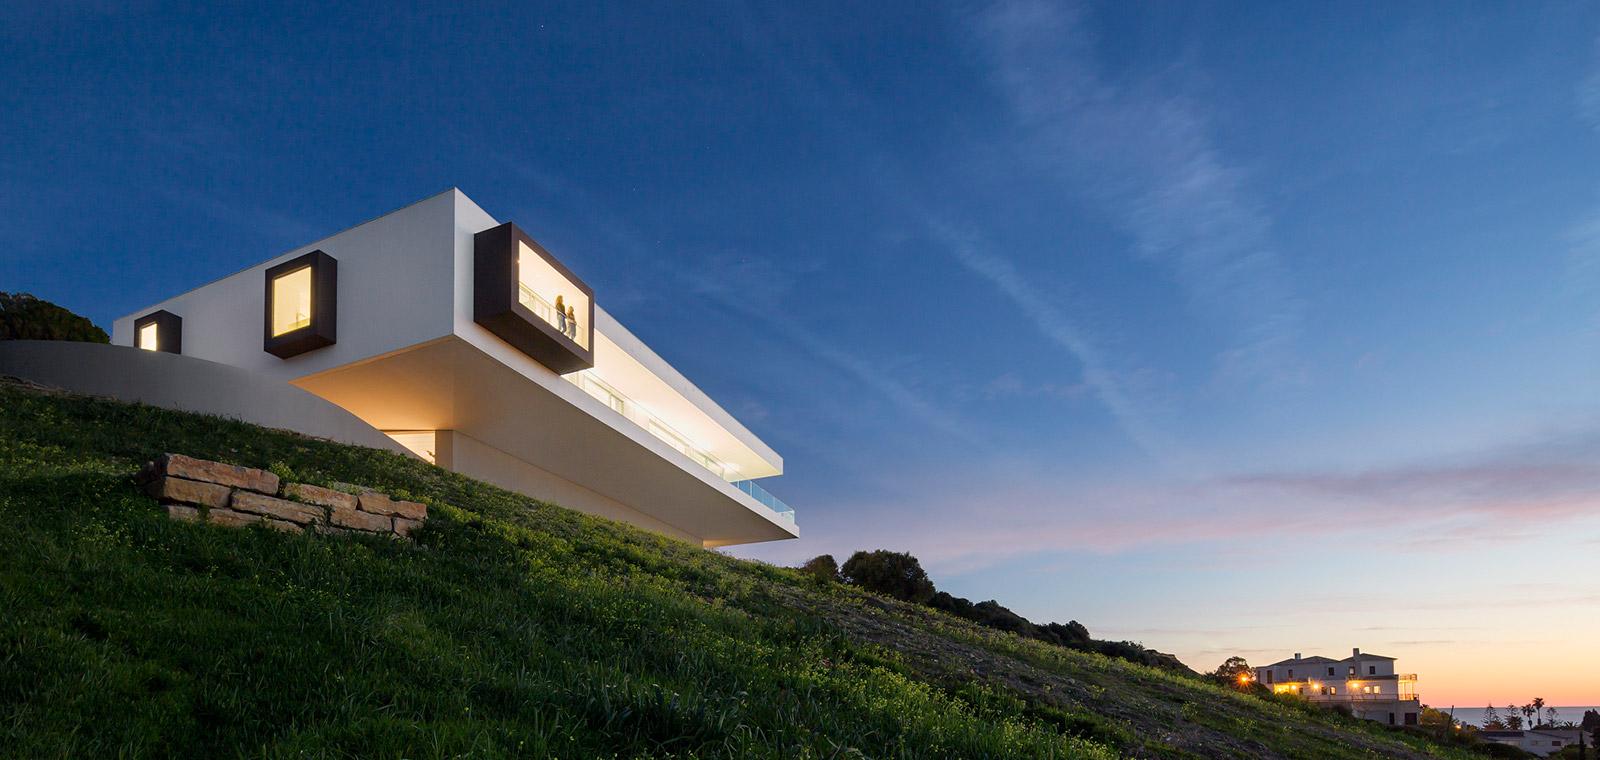 Villa Escarpa Stunning Bauhaus home by Mario Martins Atelier